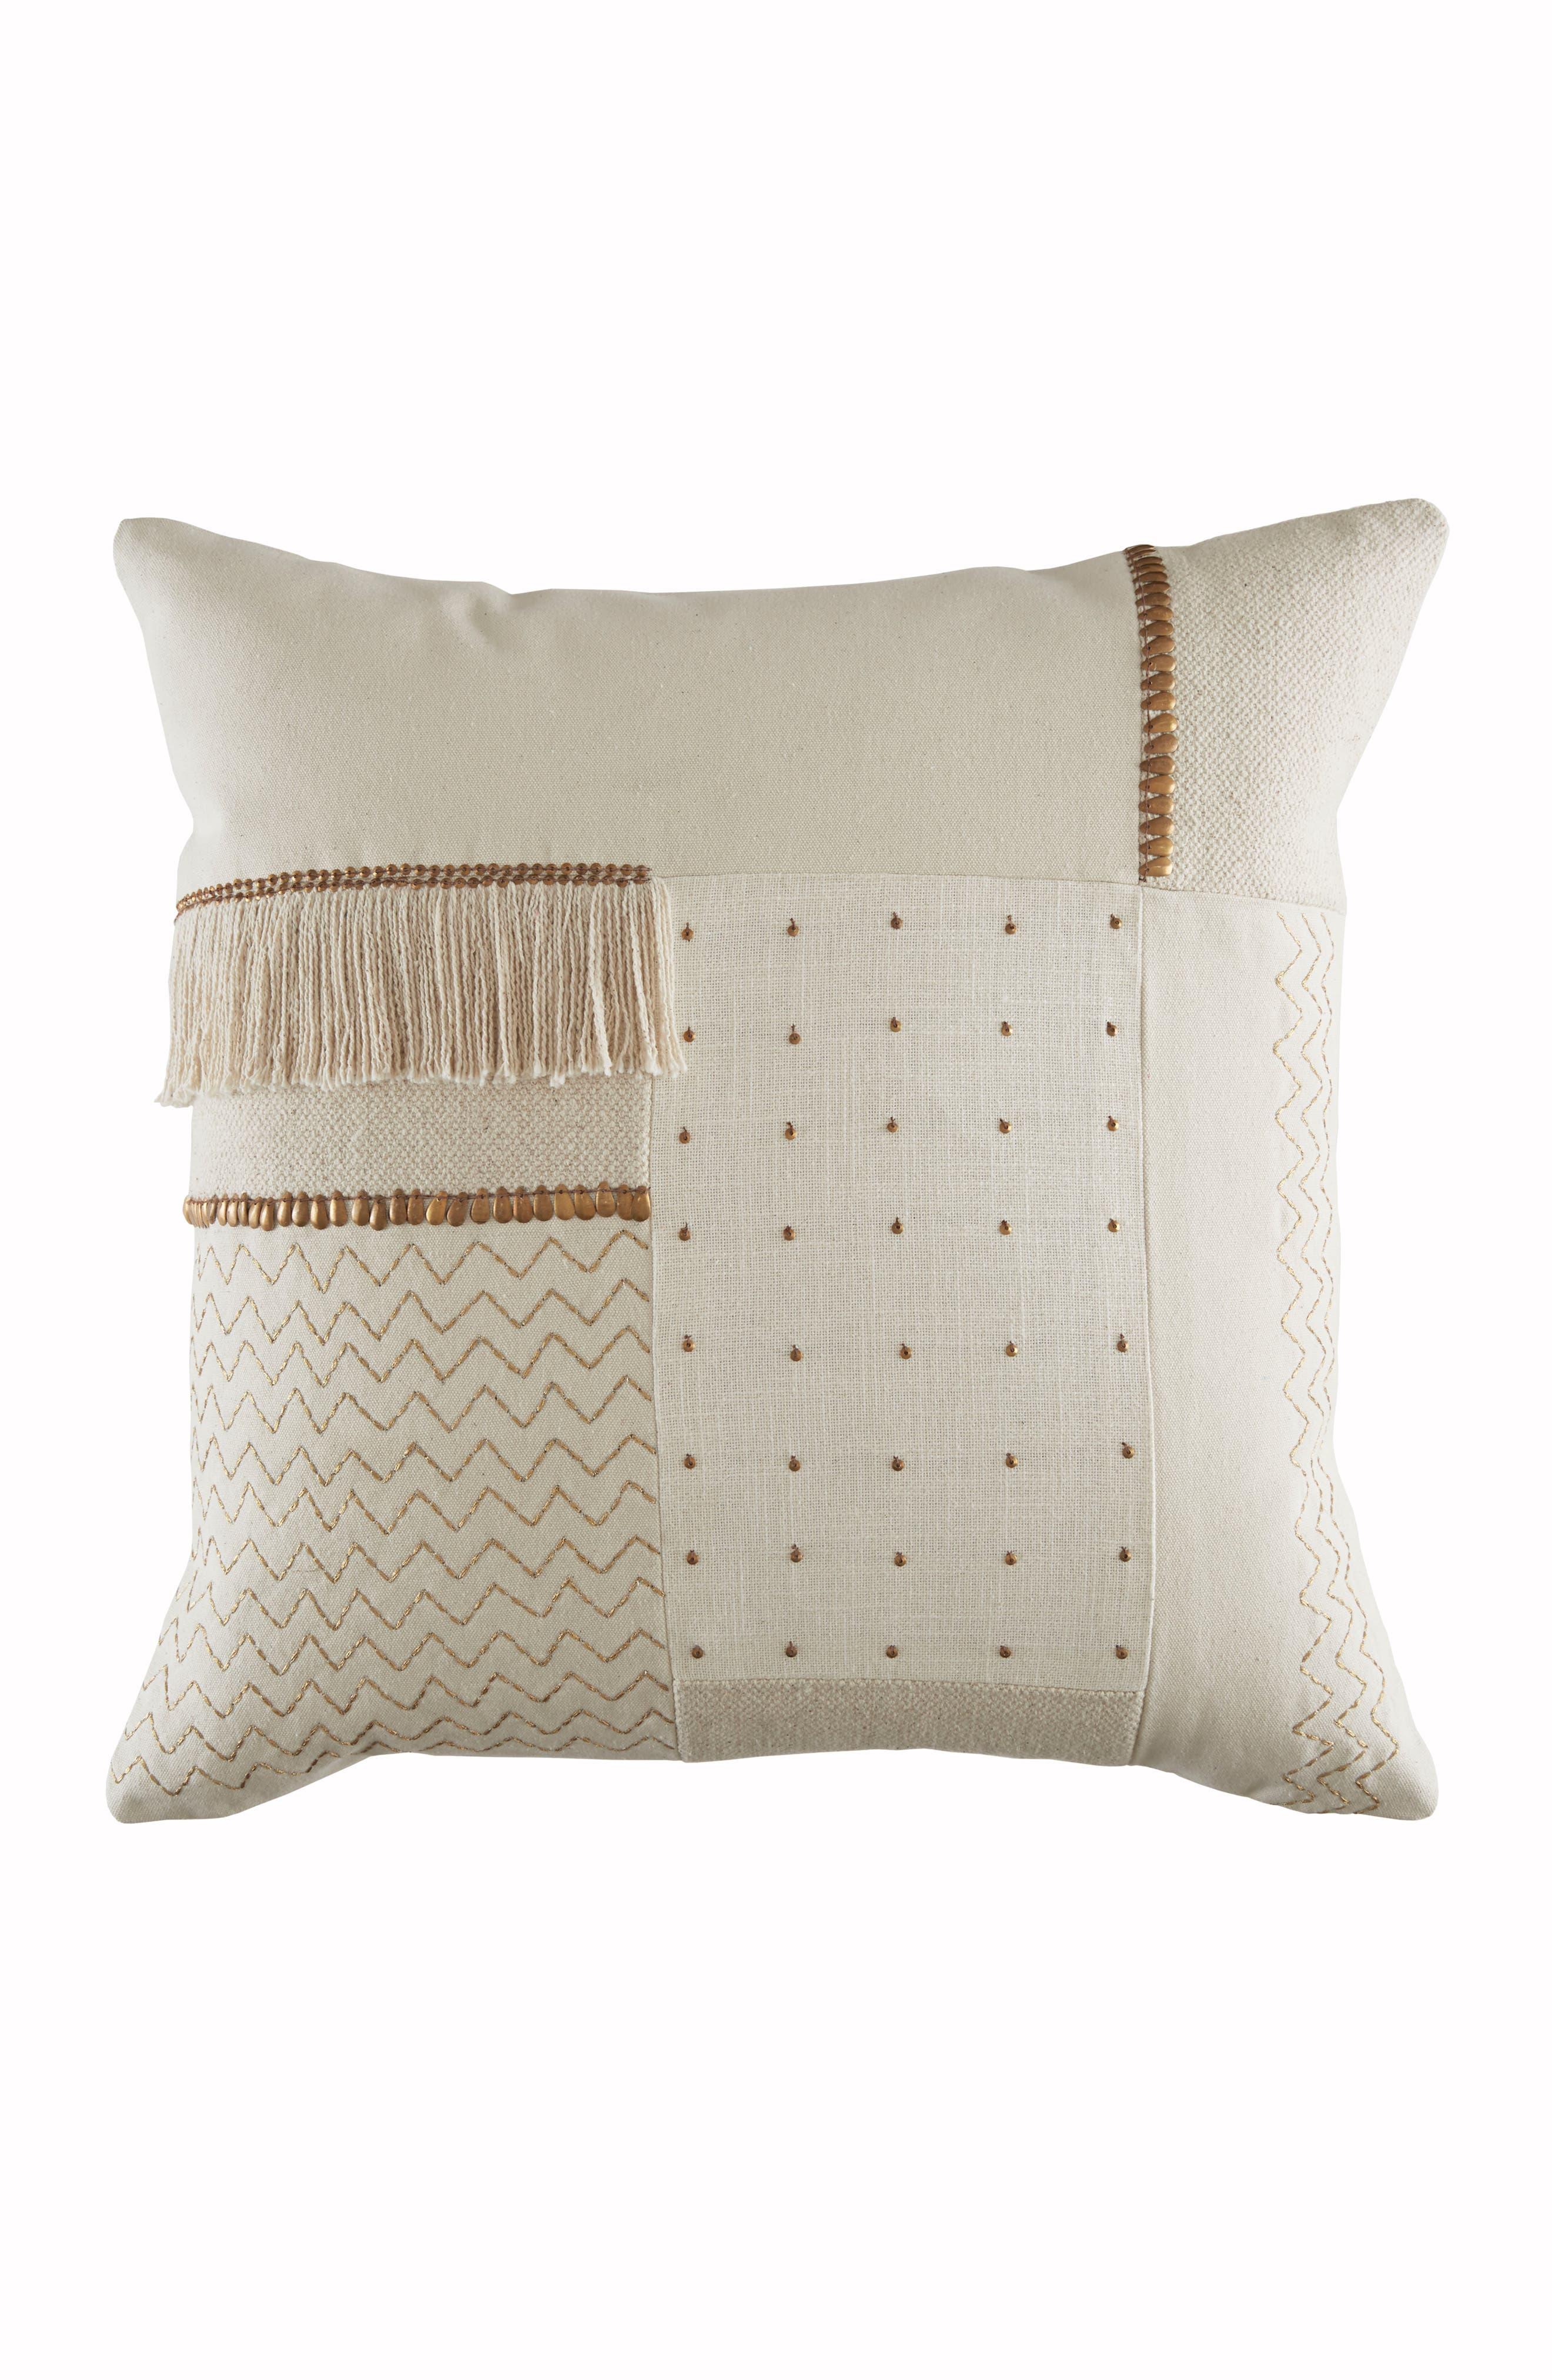 Main Image - DwellStudio Zadie Accent Pillow